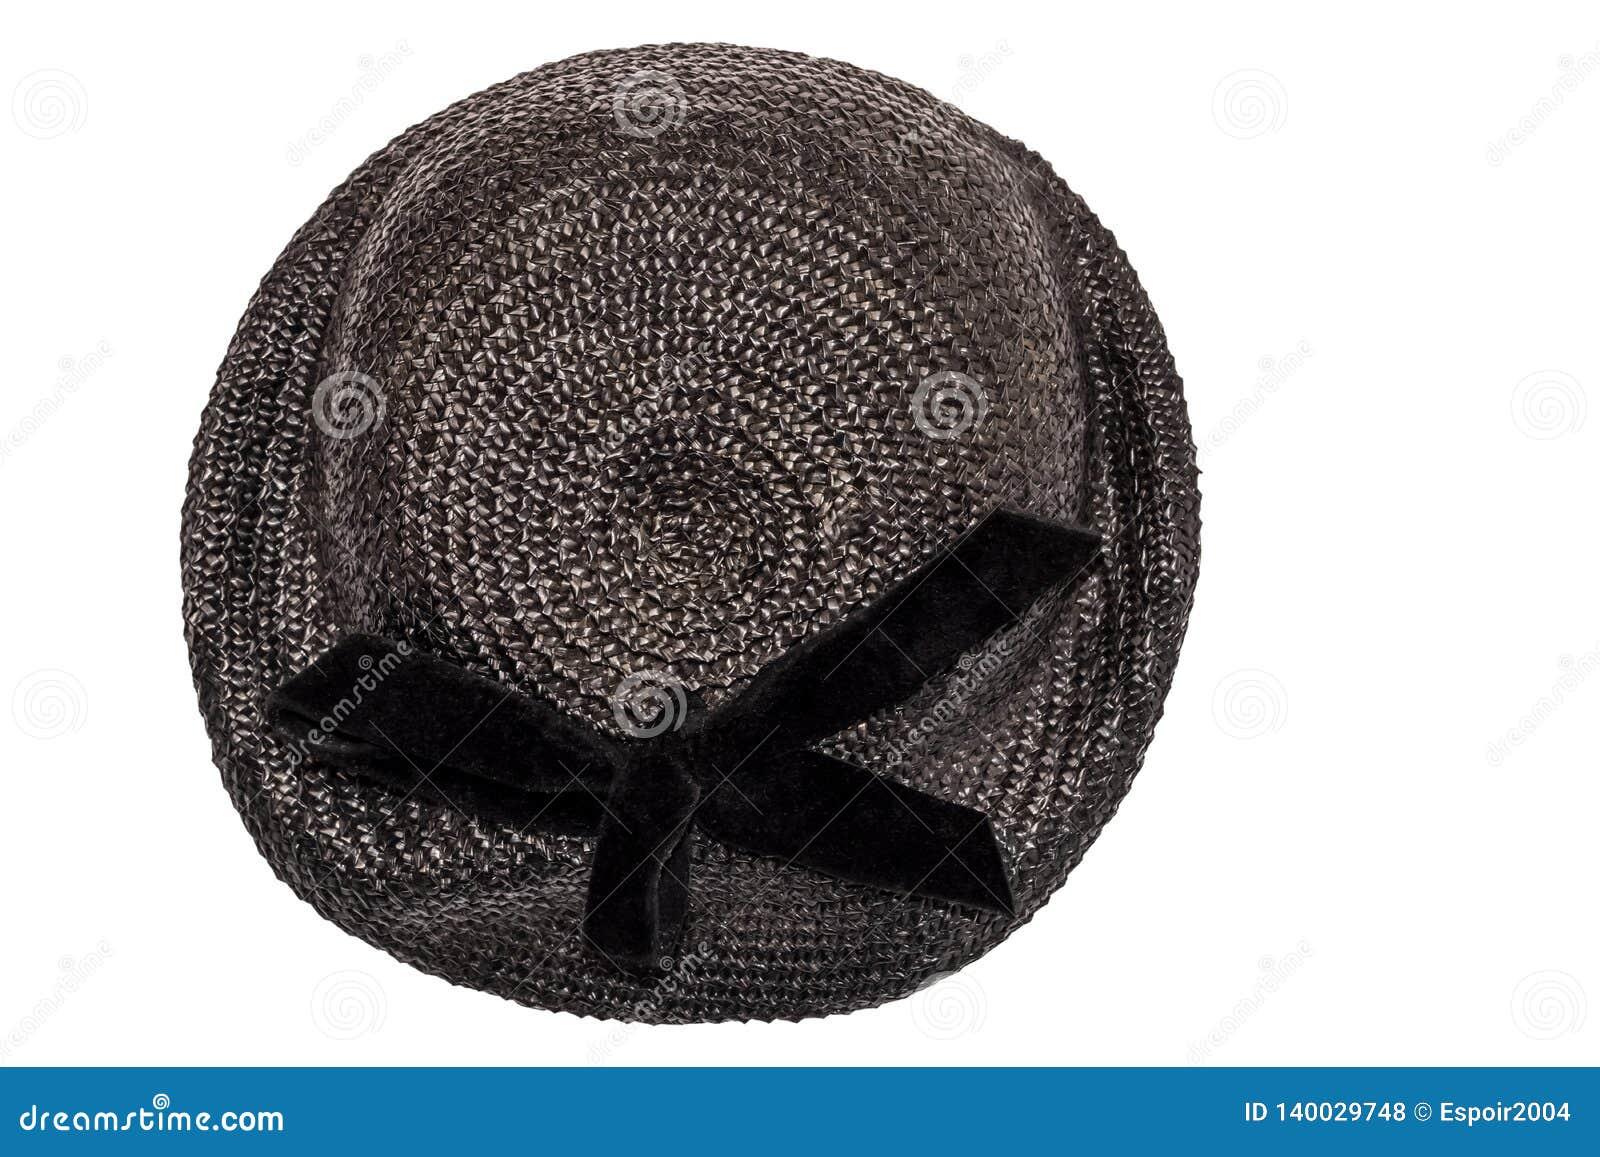 1b35b254e171a Black female hat with brim vintage fashion of the early twentieth century.